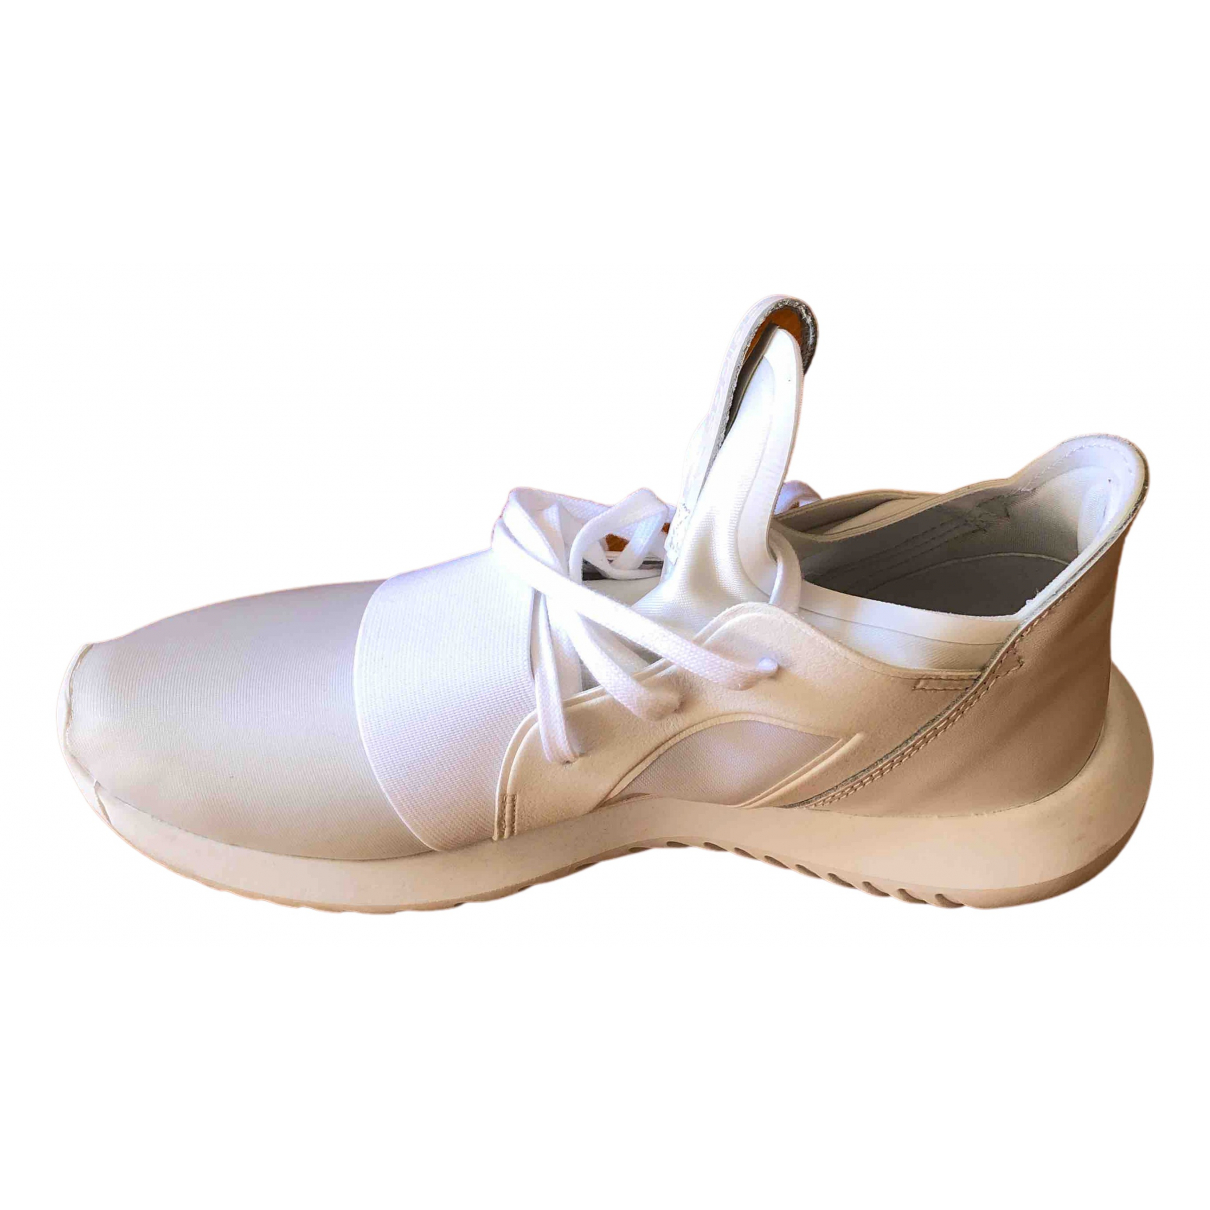 Adidas Tubular White Trainers for Women 38.5 EU